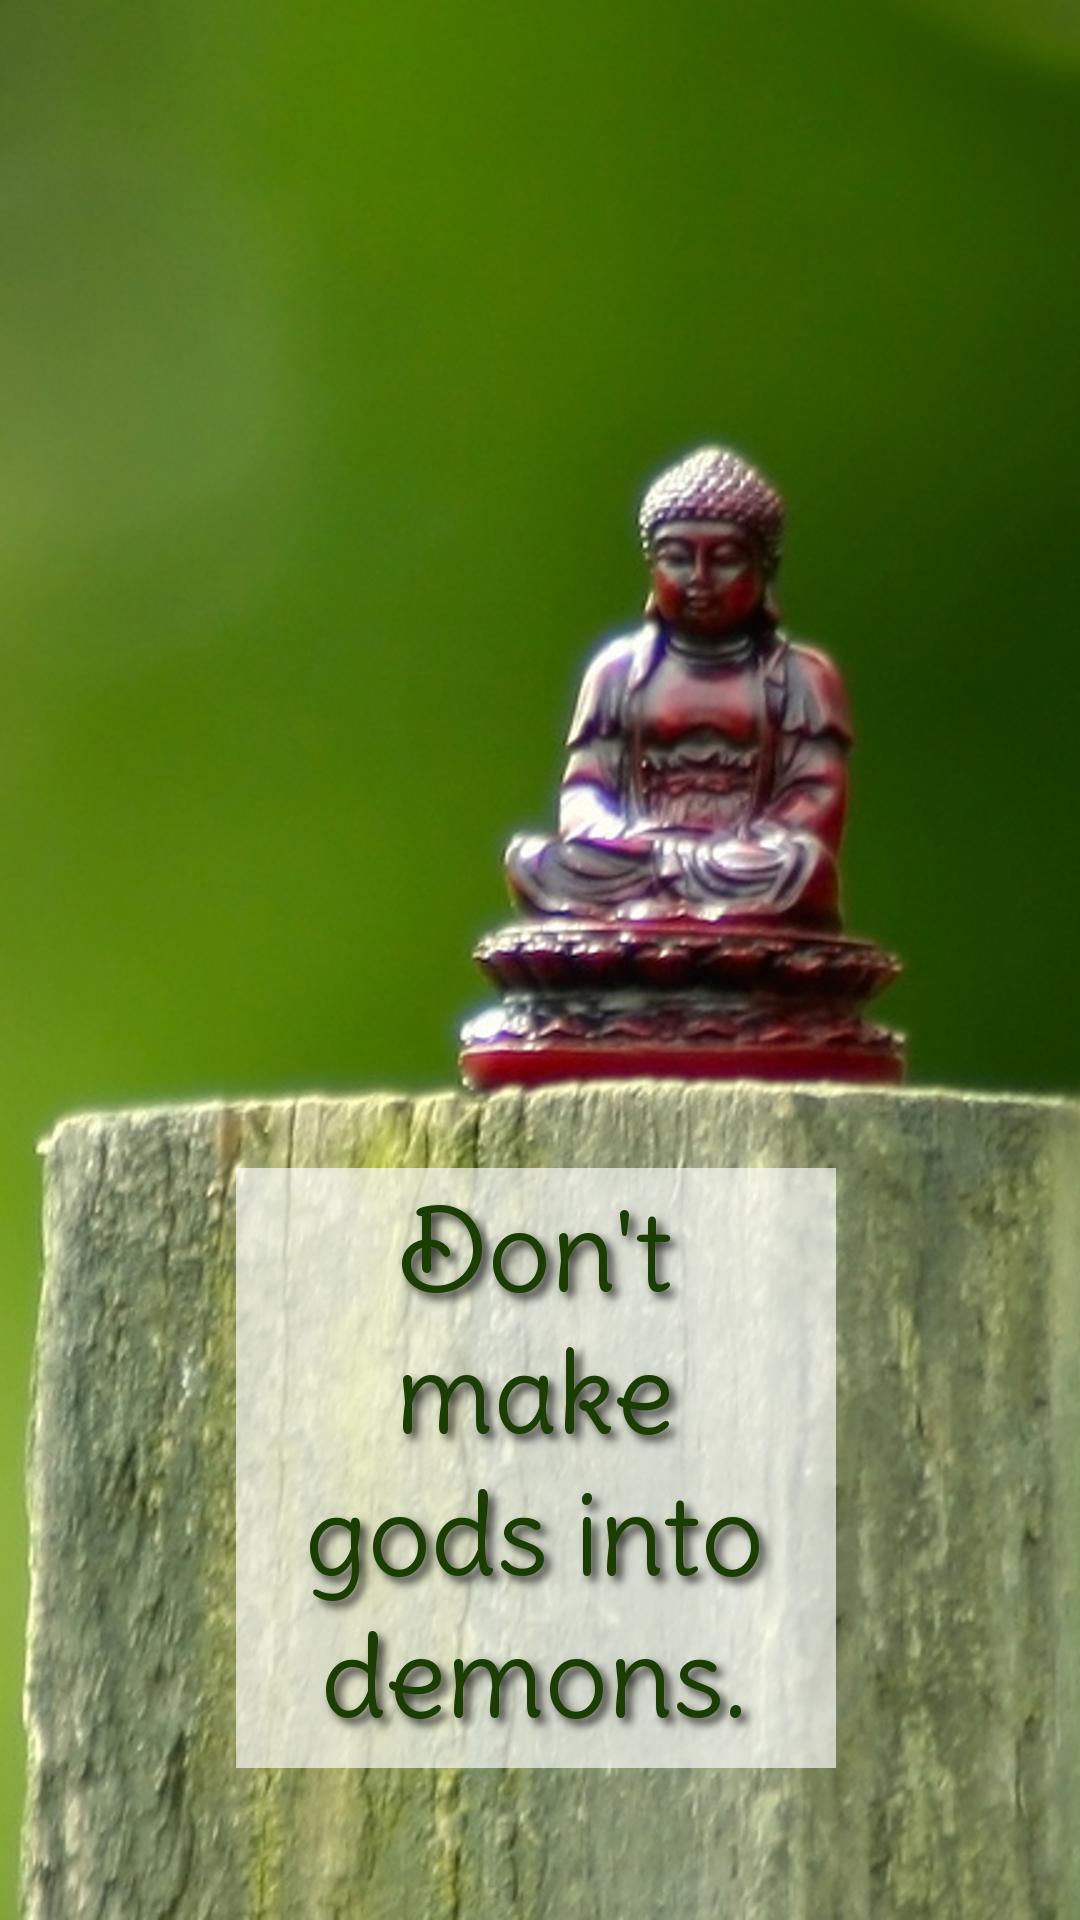 Image from: https://dharmaforeveryone.wordpress.com/2014/12/06/dont-make-gods-into-demons-2/